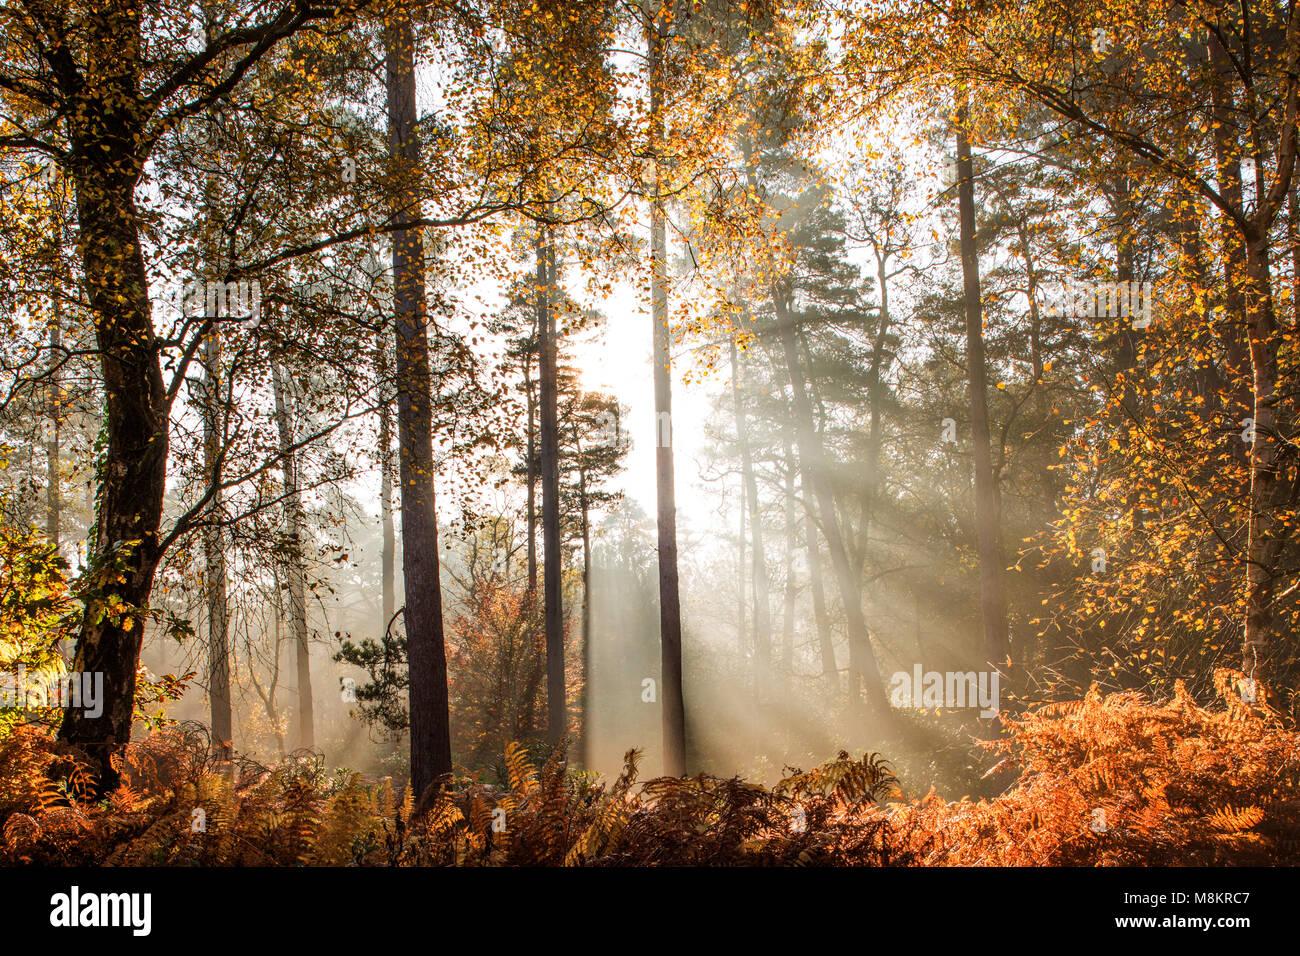 Rays of sunlight shining through early morning mist in woodland, Dorset, England, UK - Stock Image